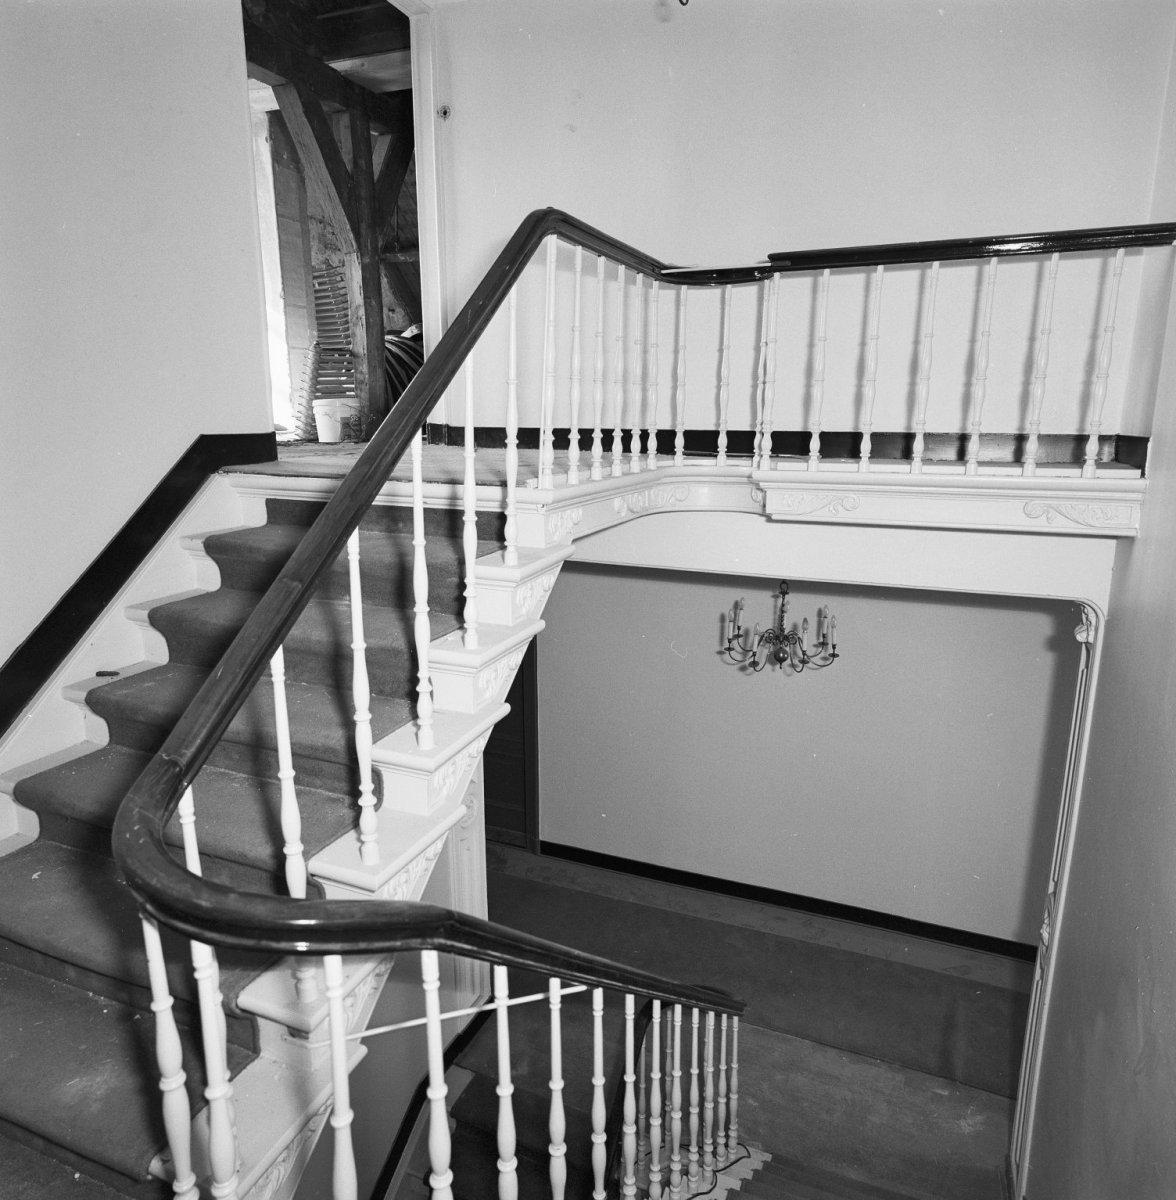 File interieur nr 17 trap bovenste verdieping 39 s hertogenbosch 20345498 - Interieur trap ...